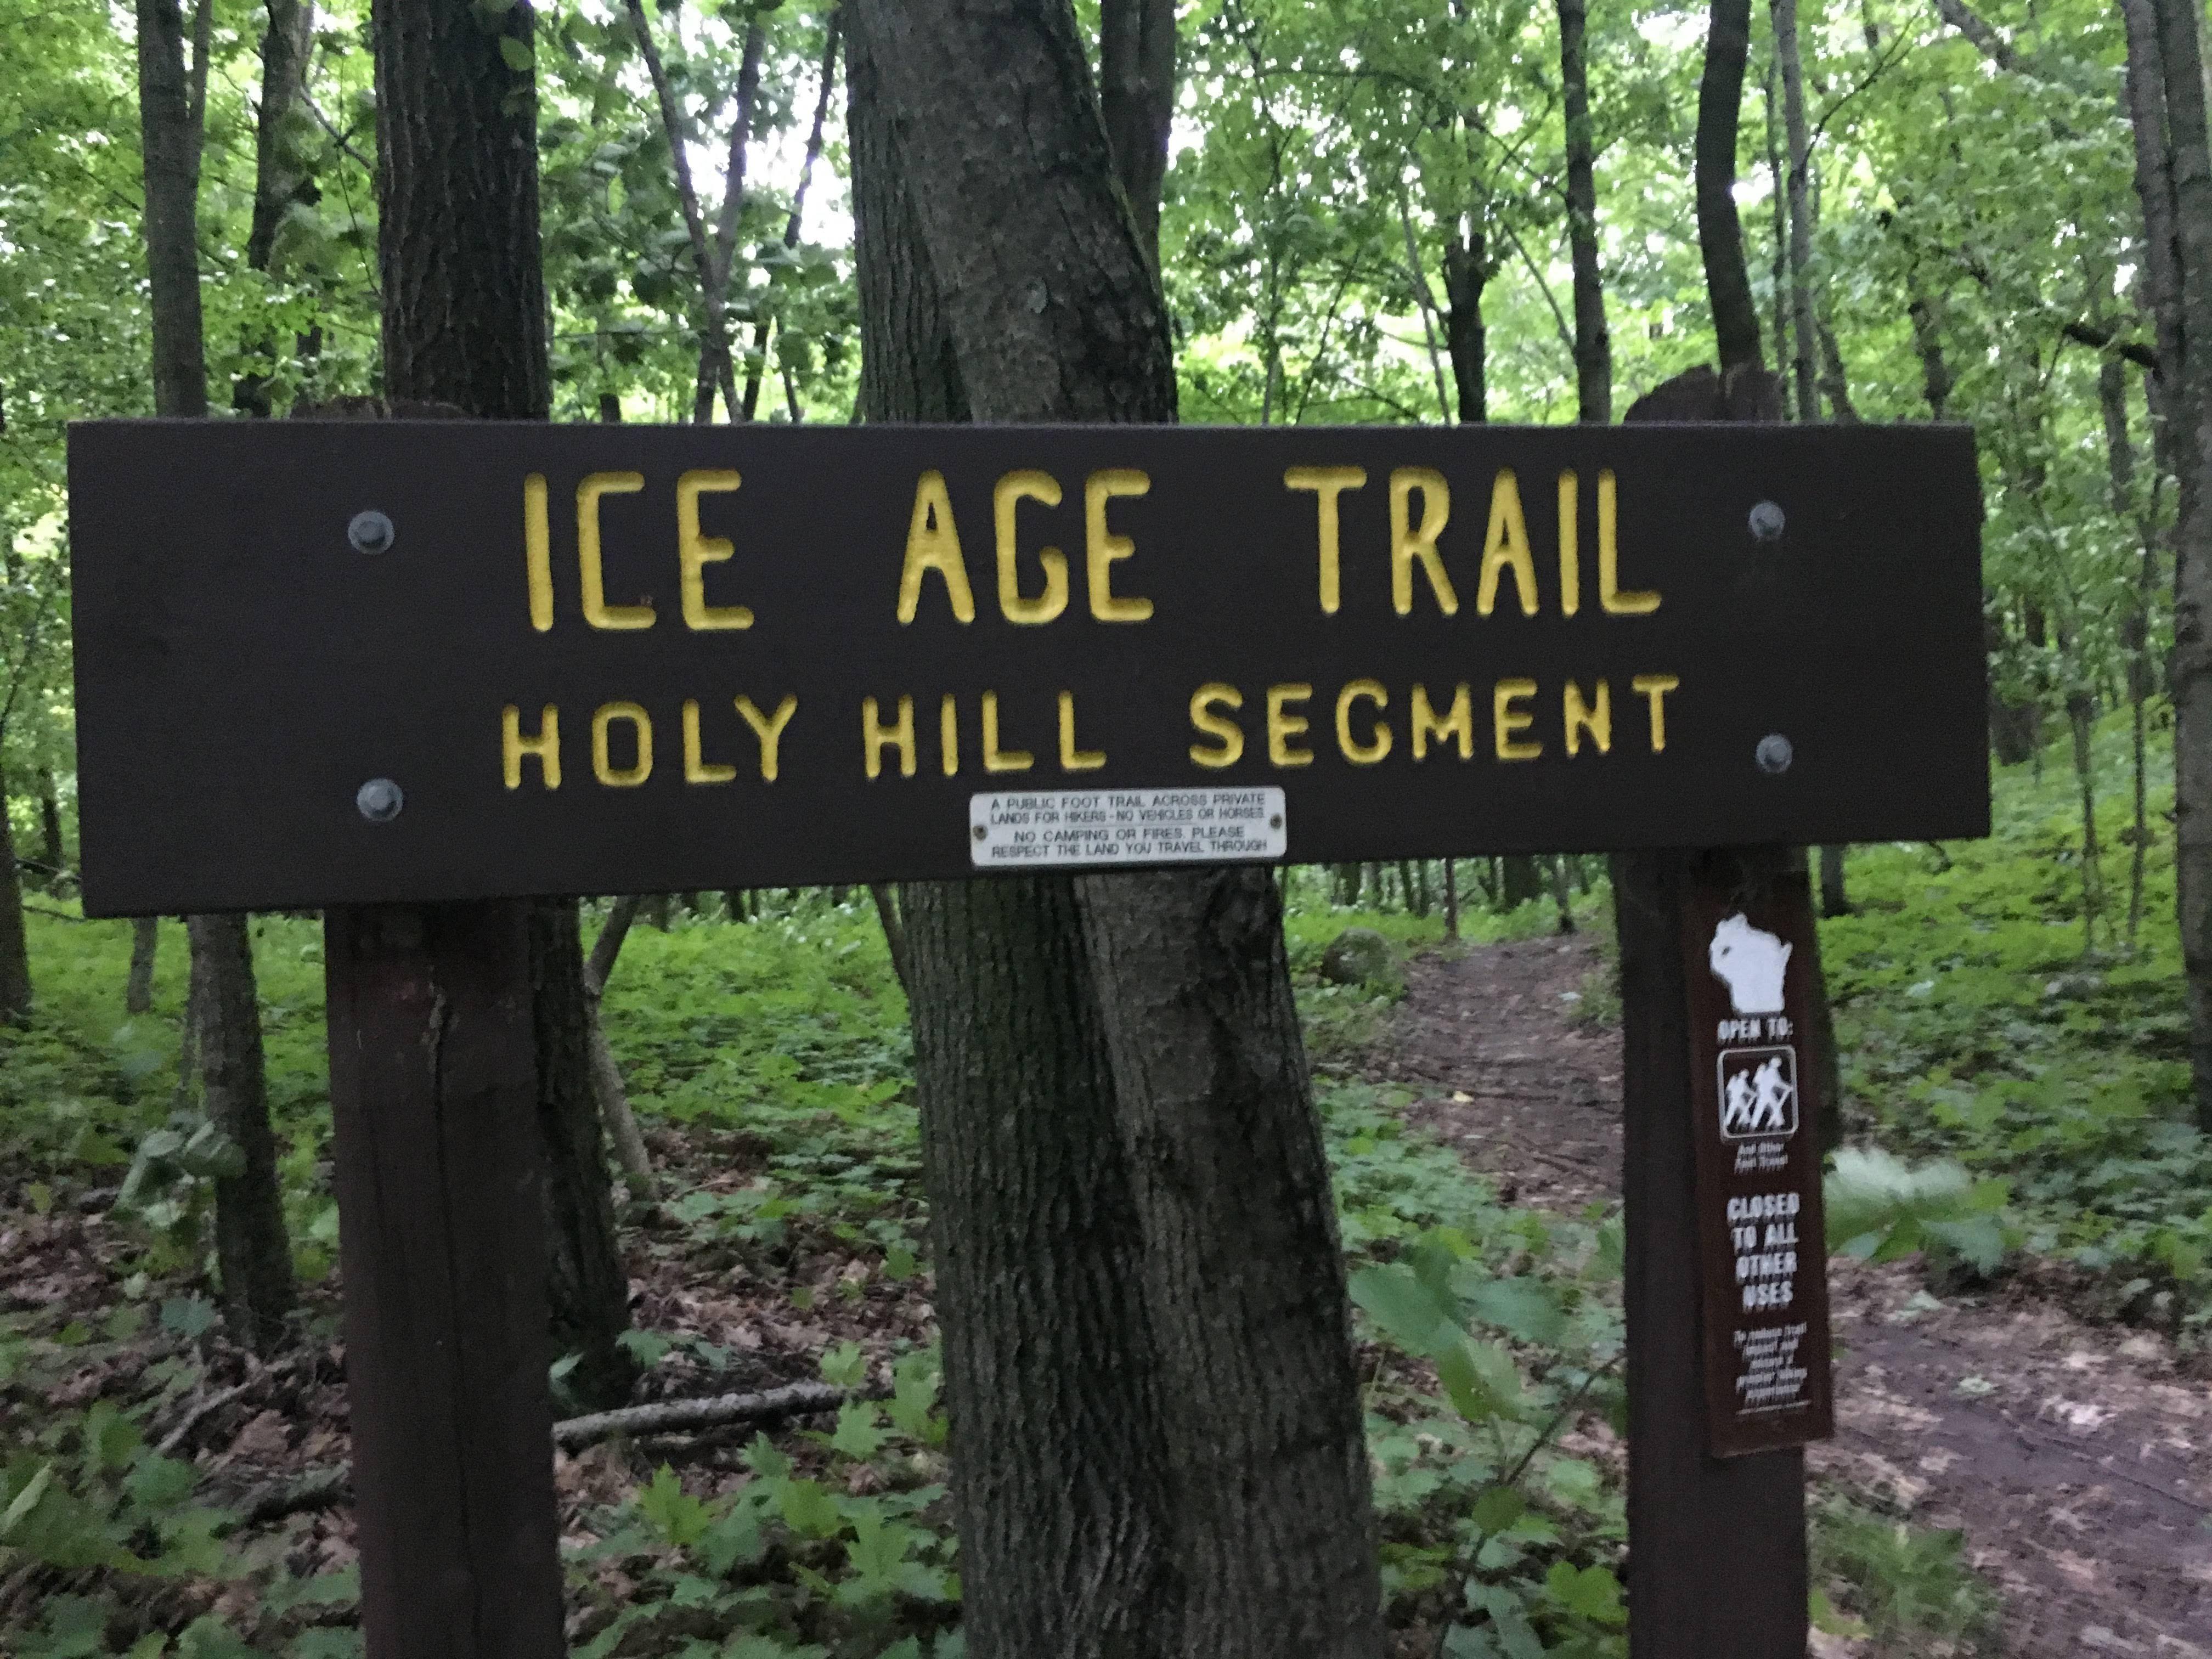 Holy Hill Segment